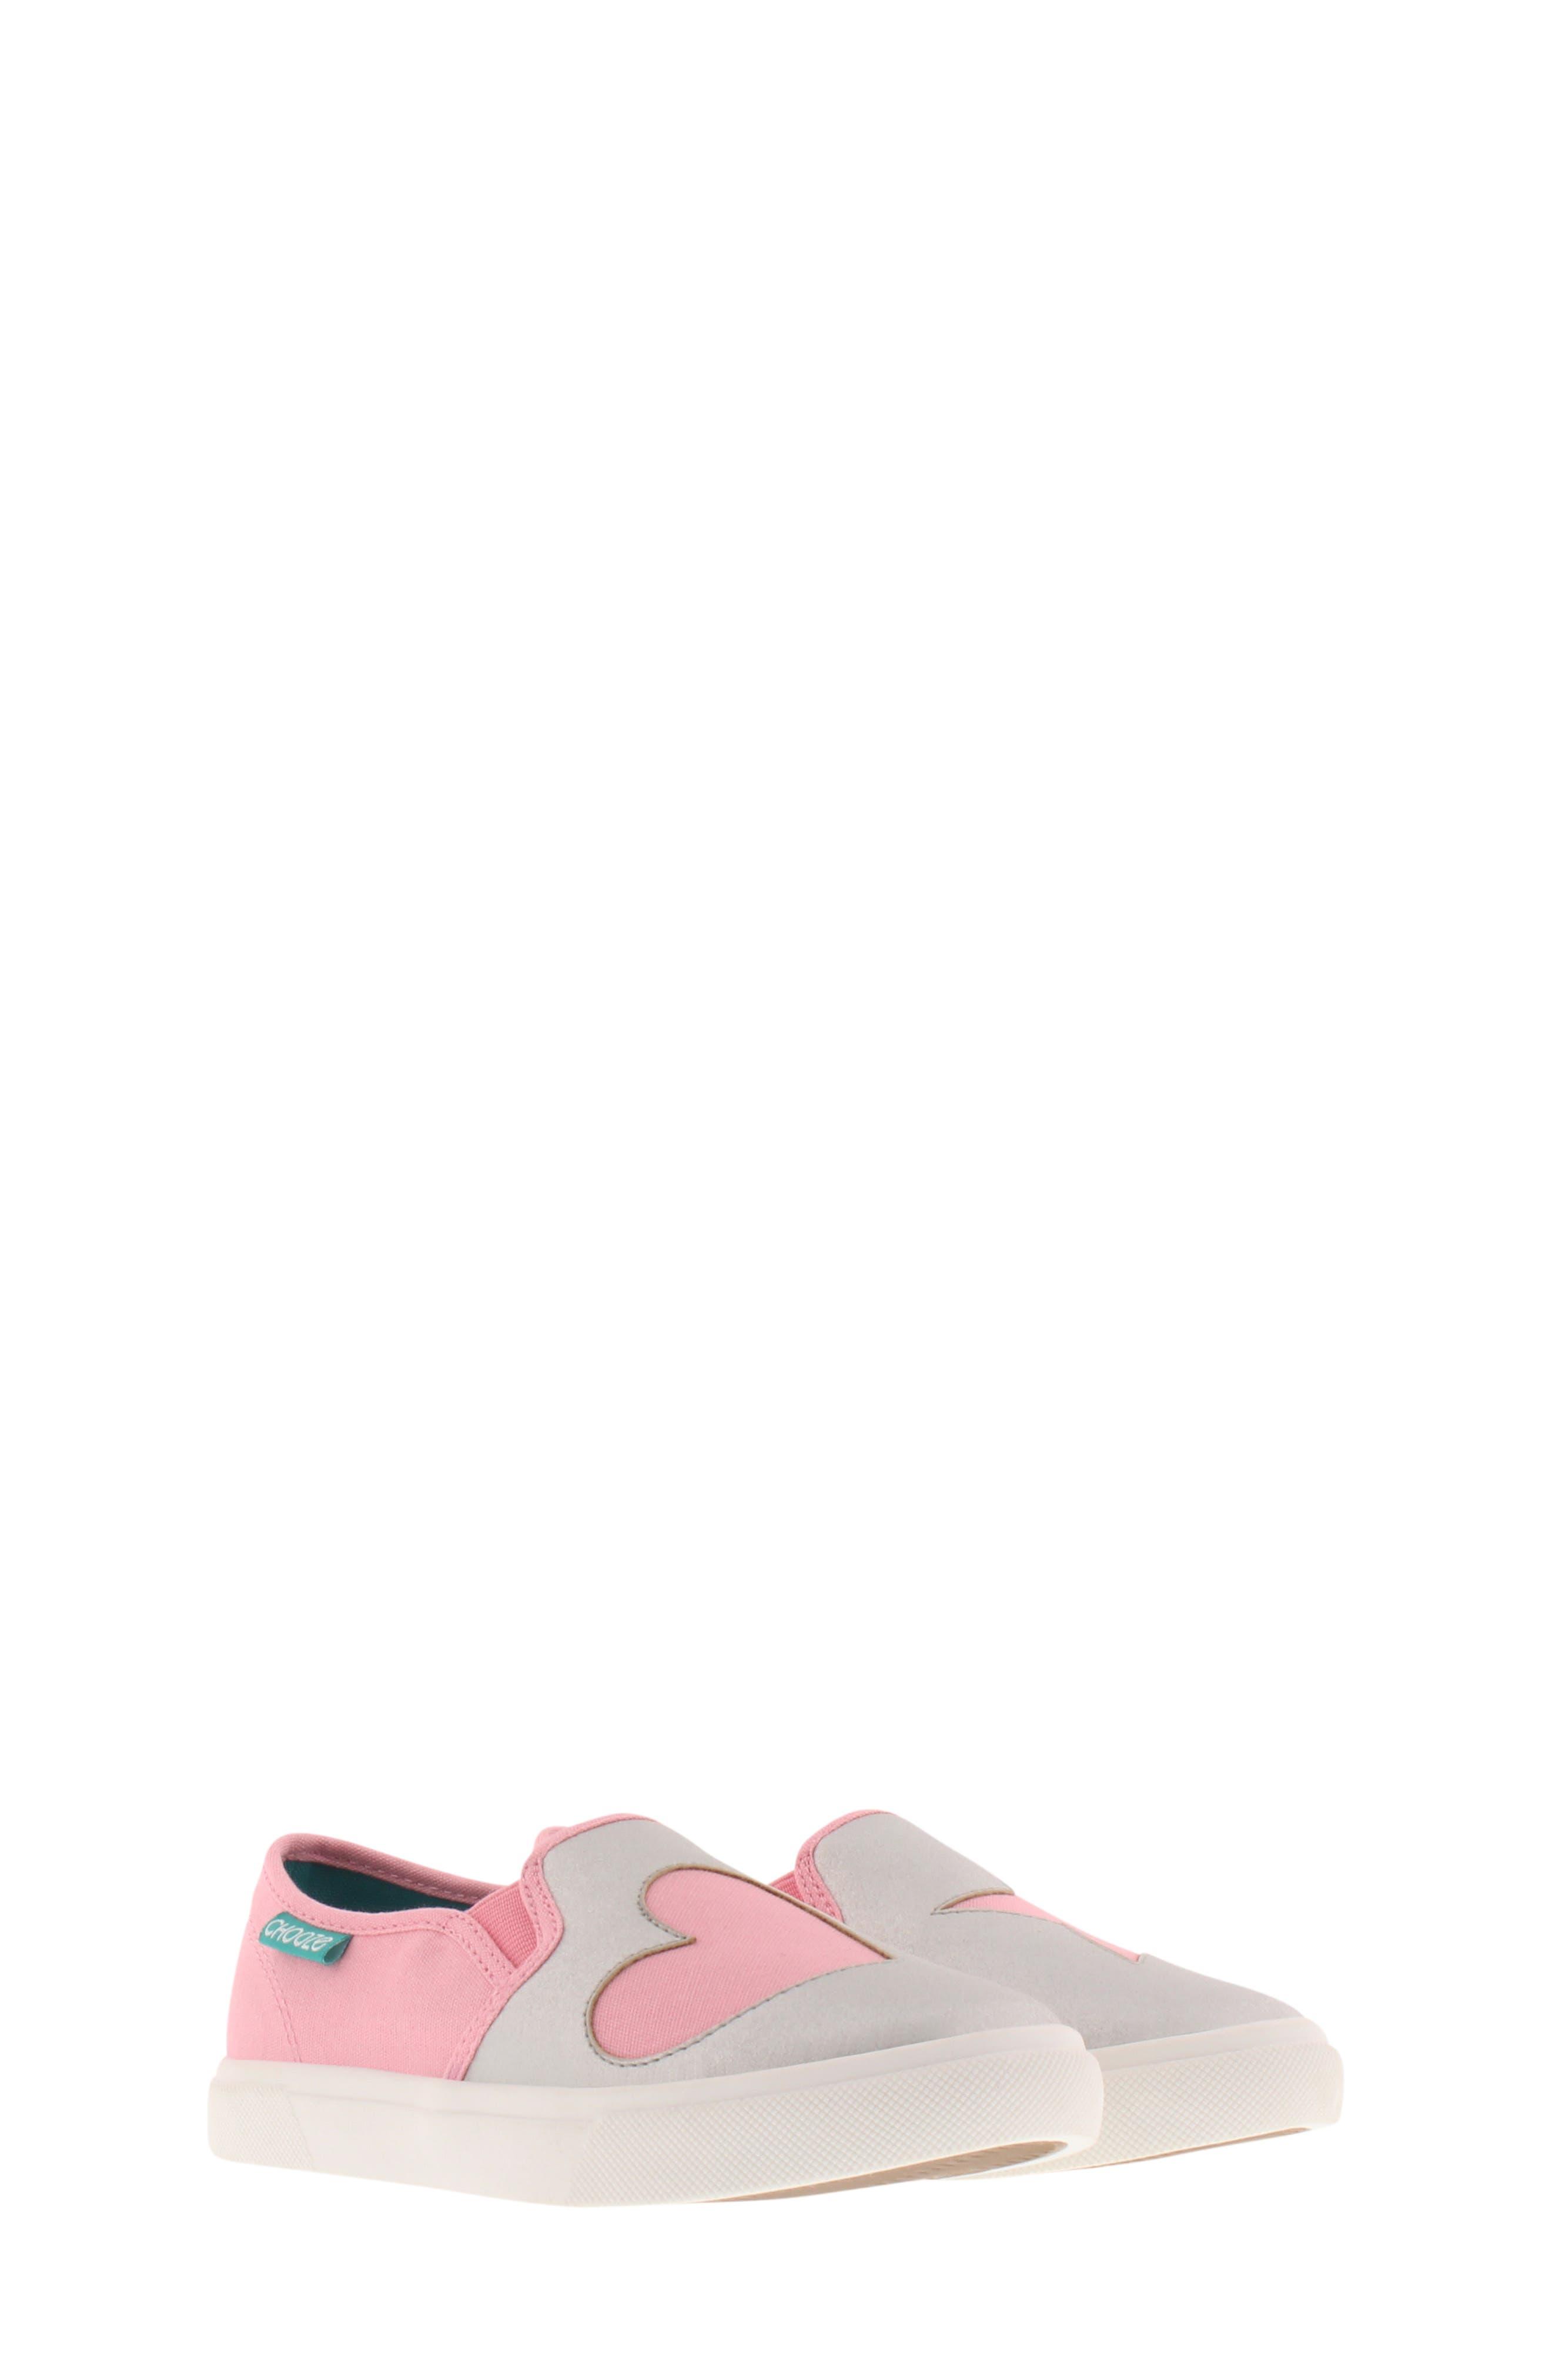 CHOOZE Little Choice Starheart Slip-On Sneaker, Main, color, SILVER